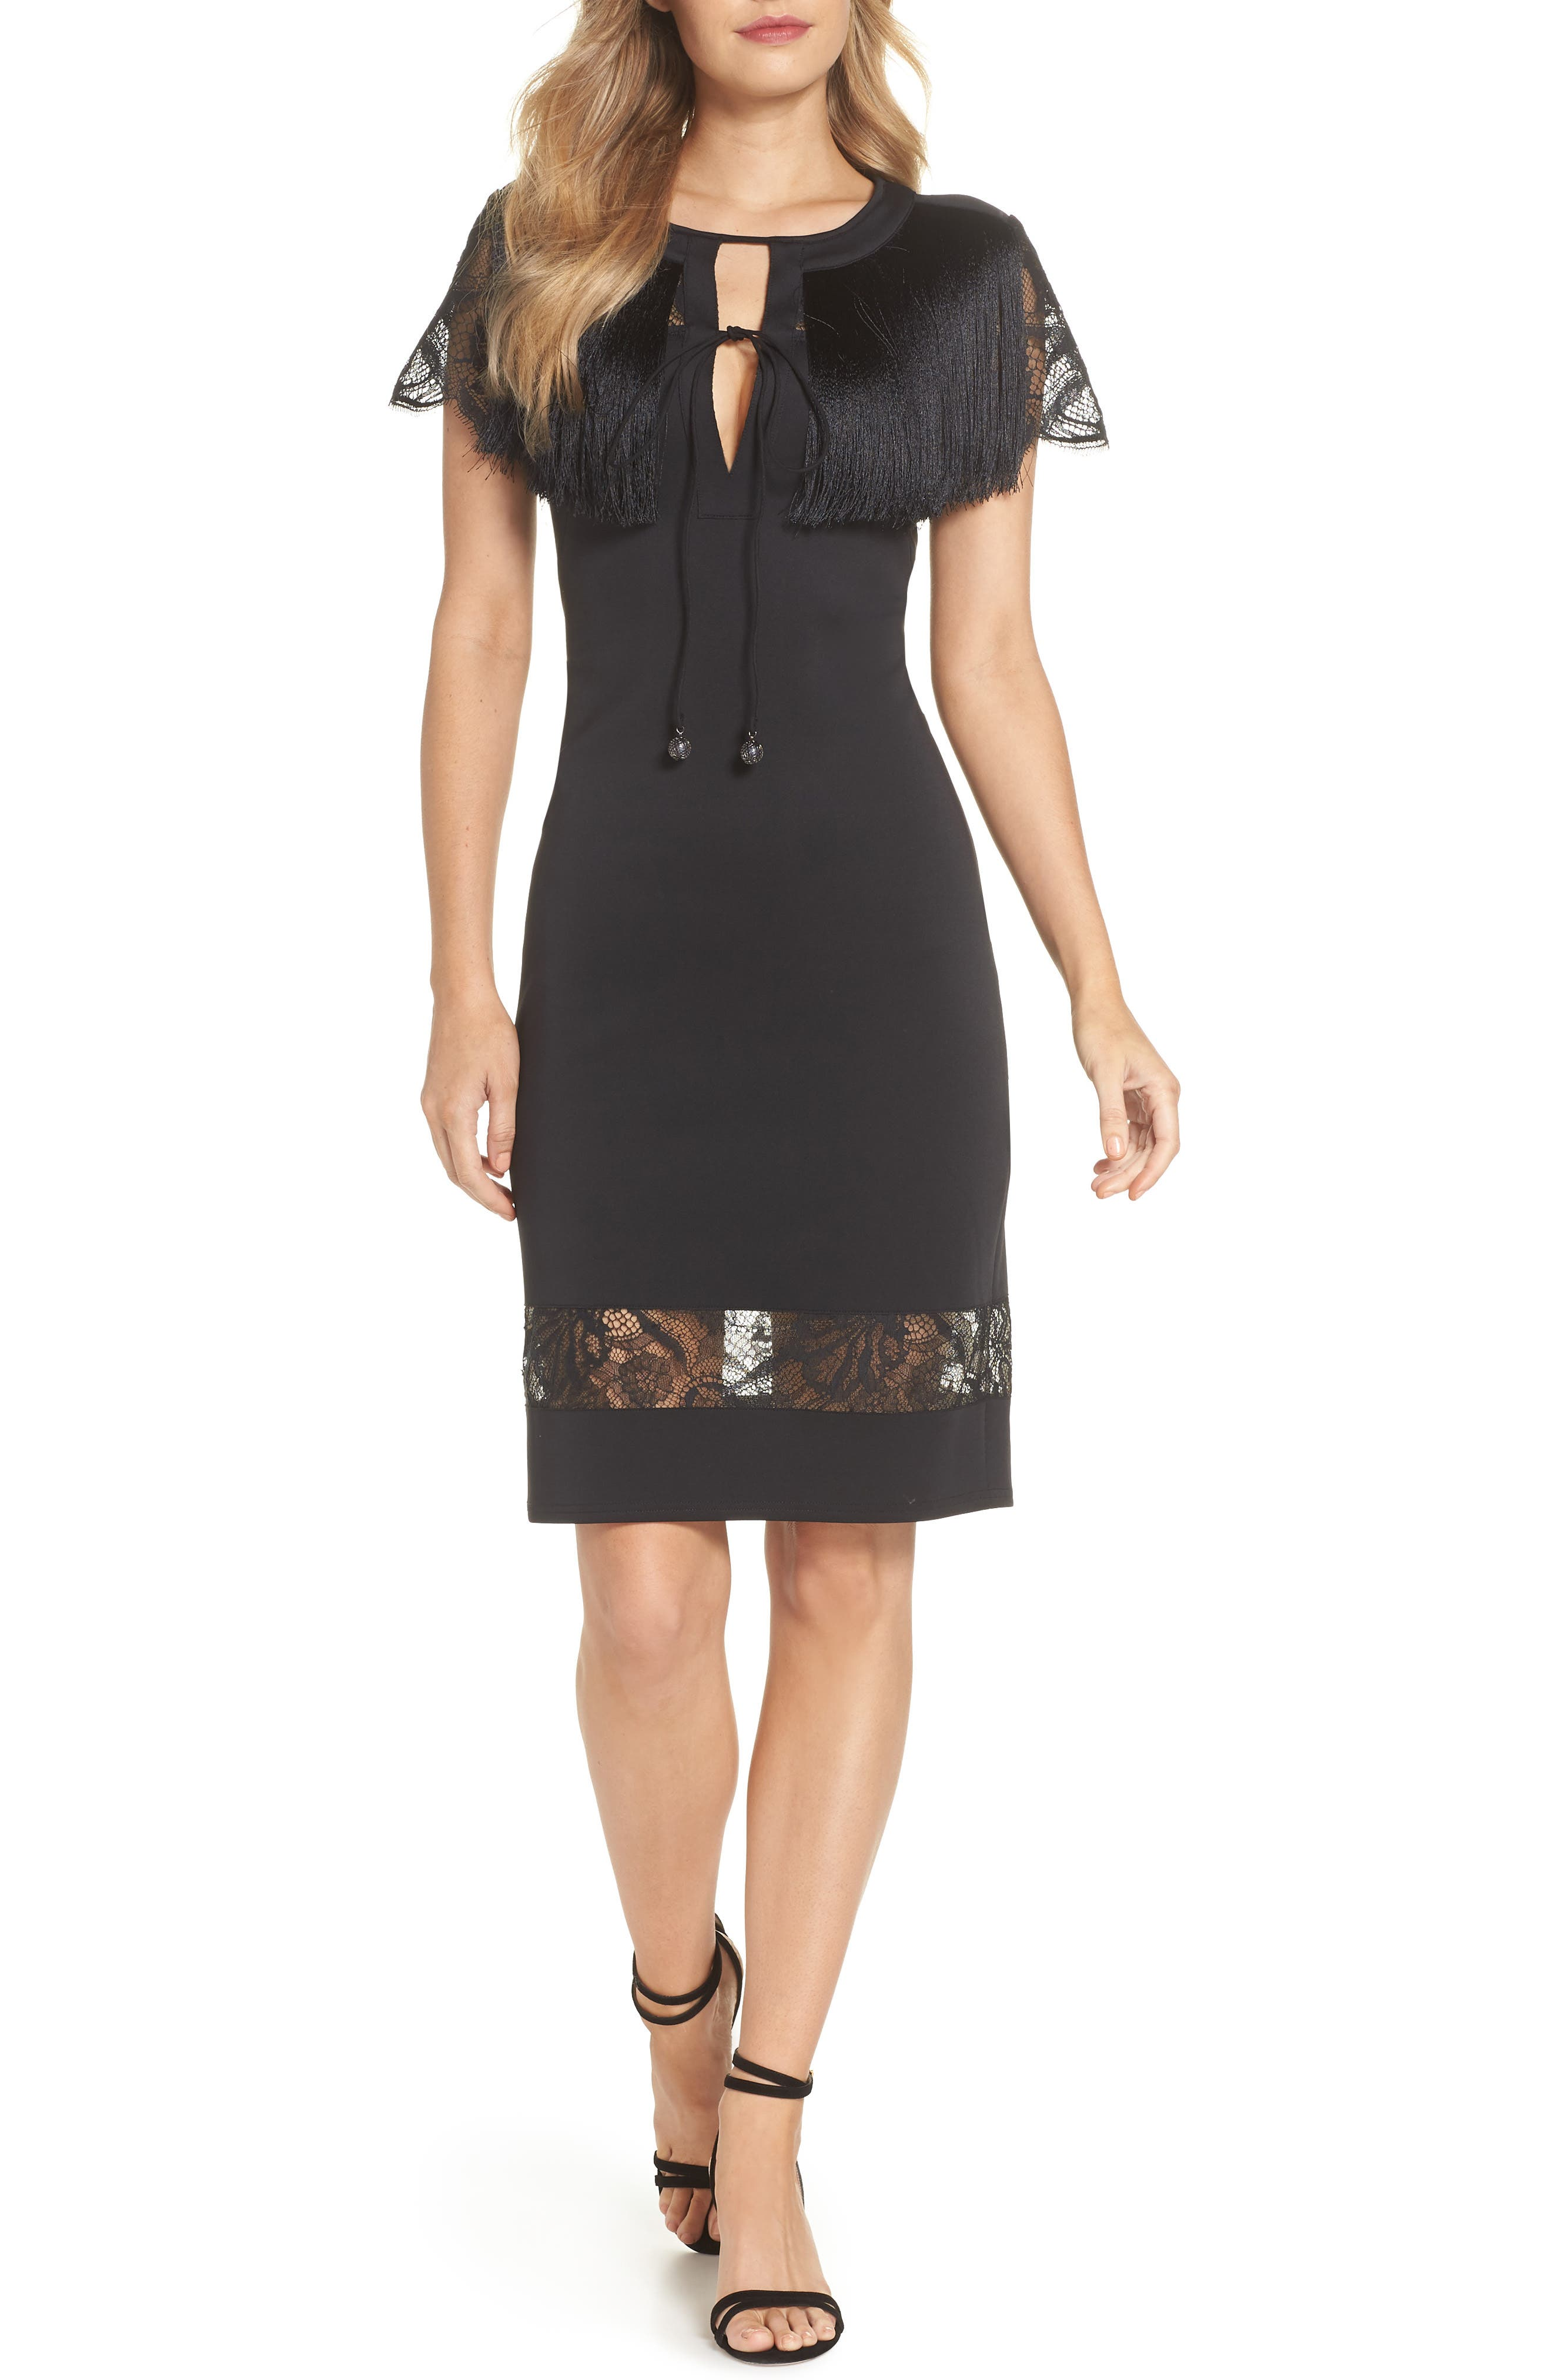 LACE & FRINGE COCKTAIL DRESS